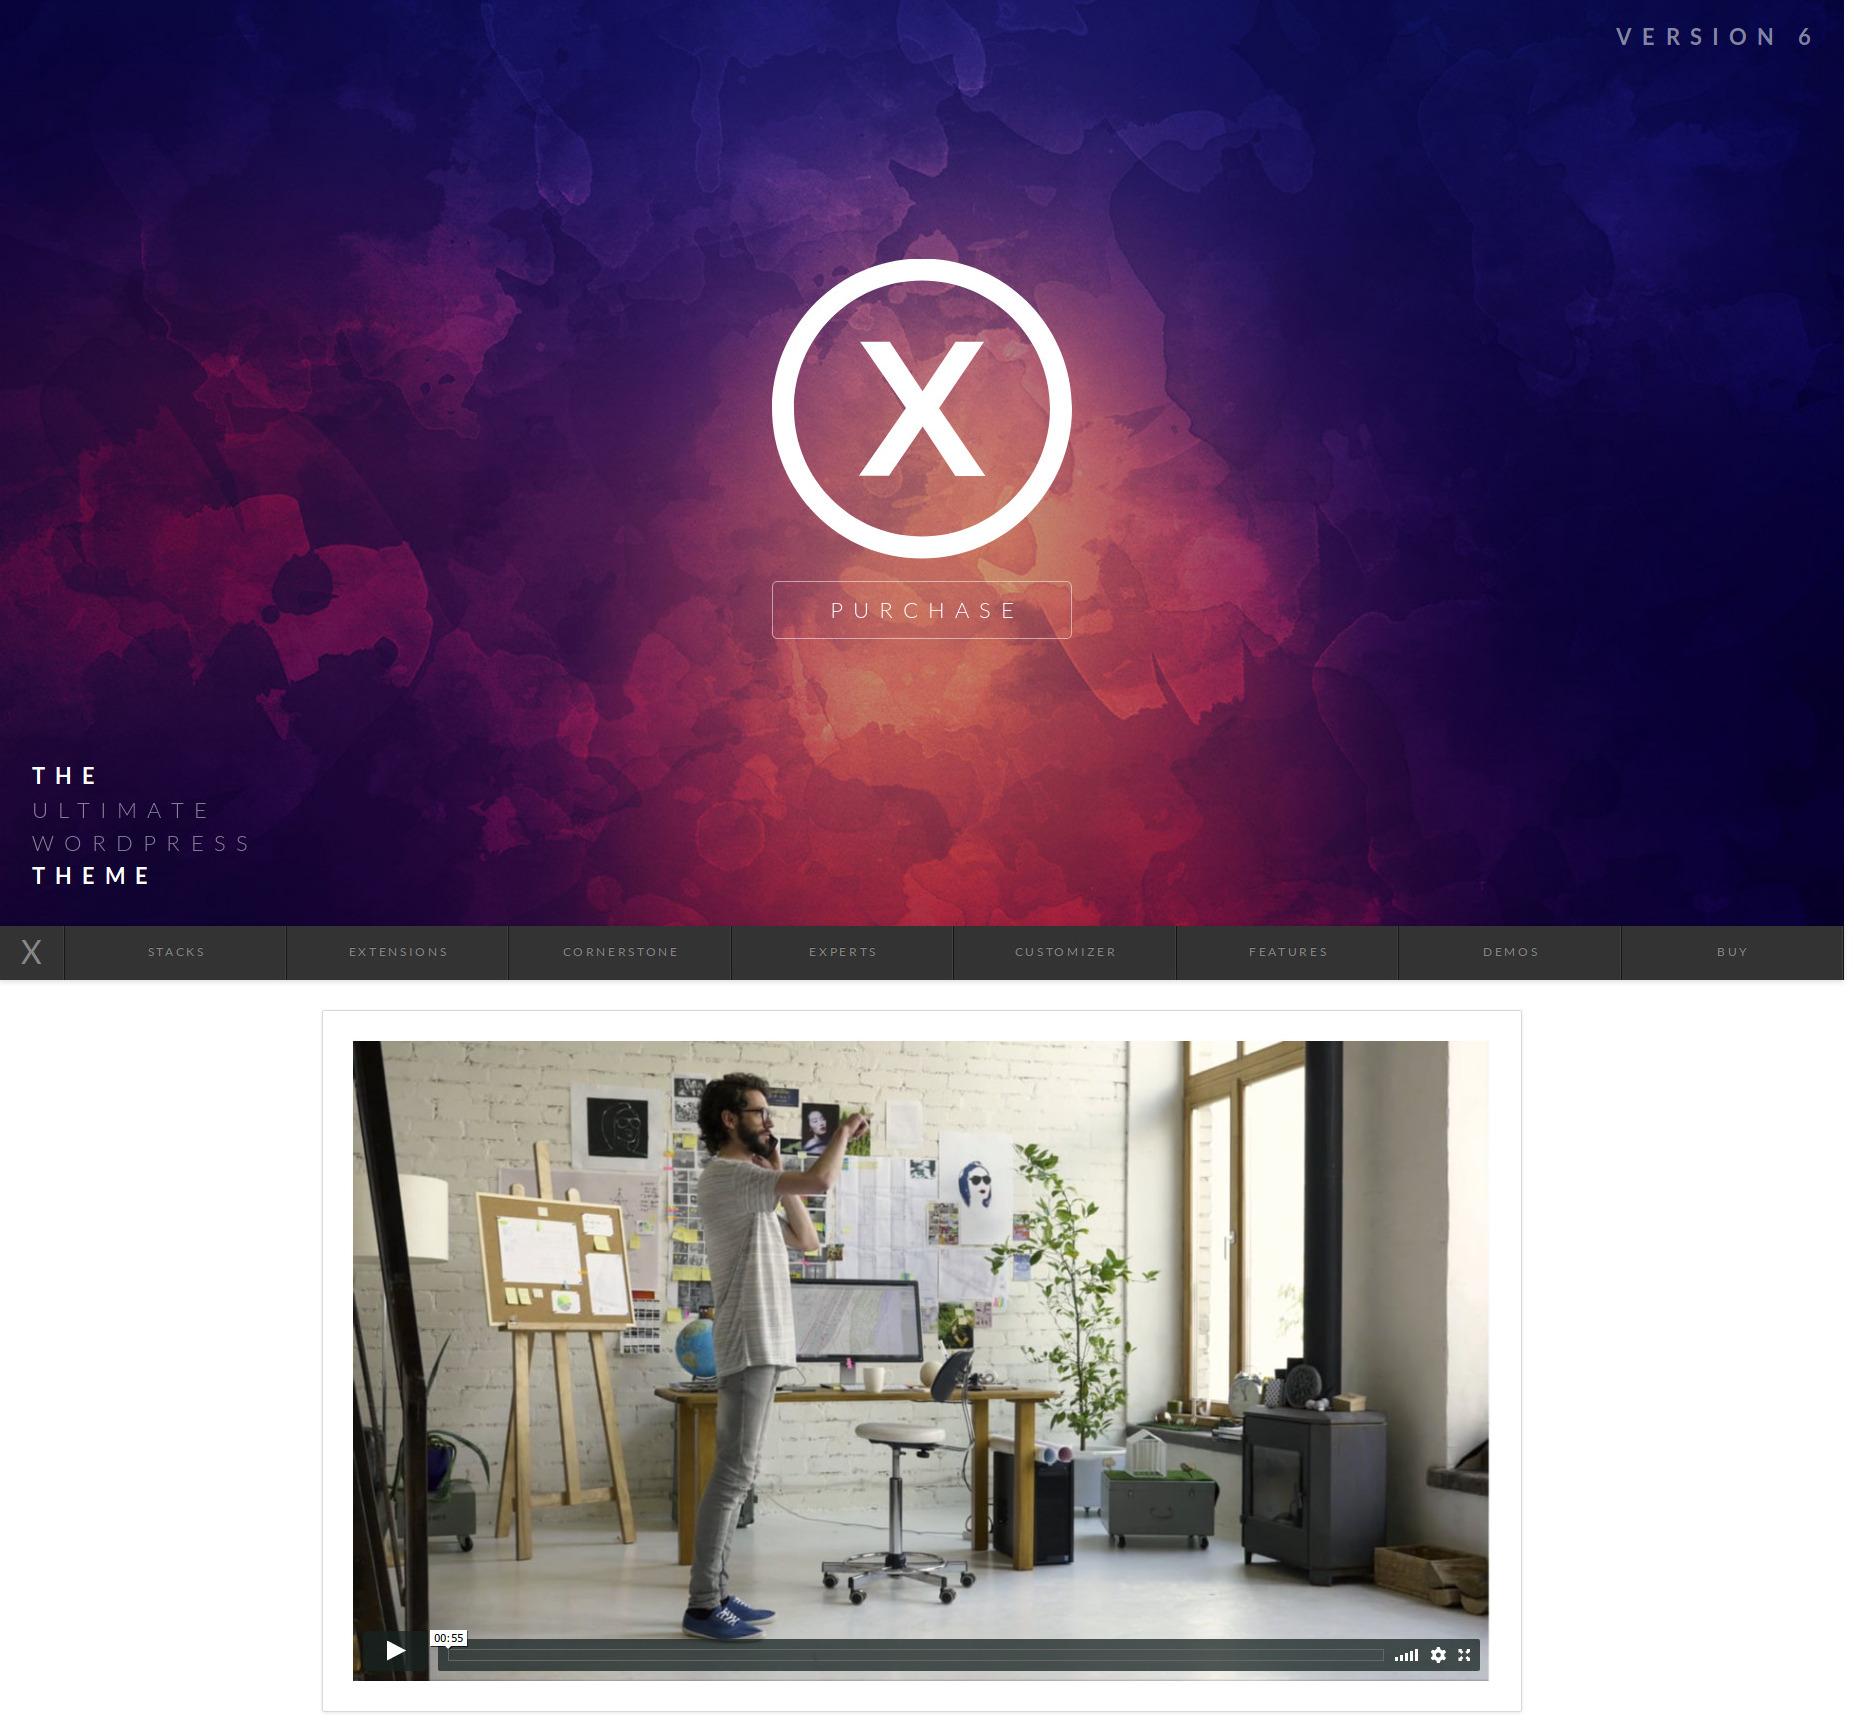 X themes